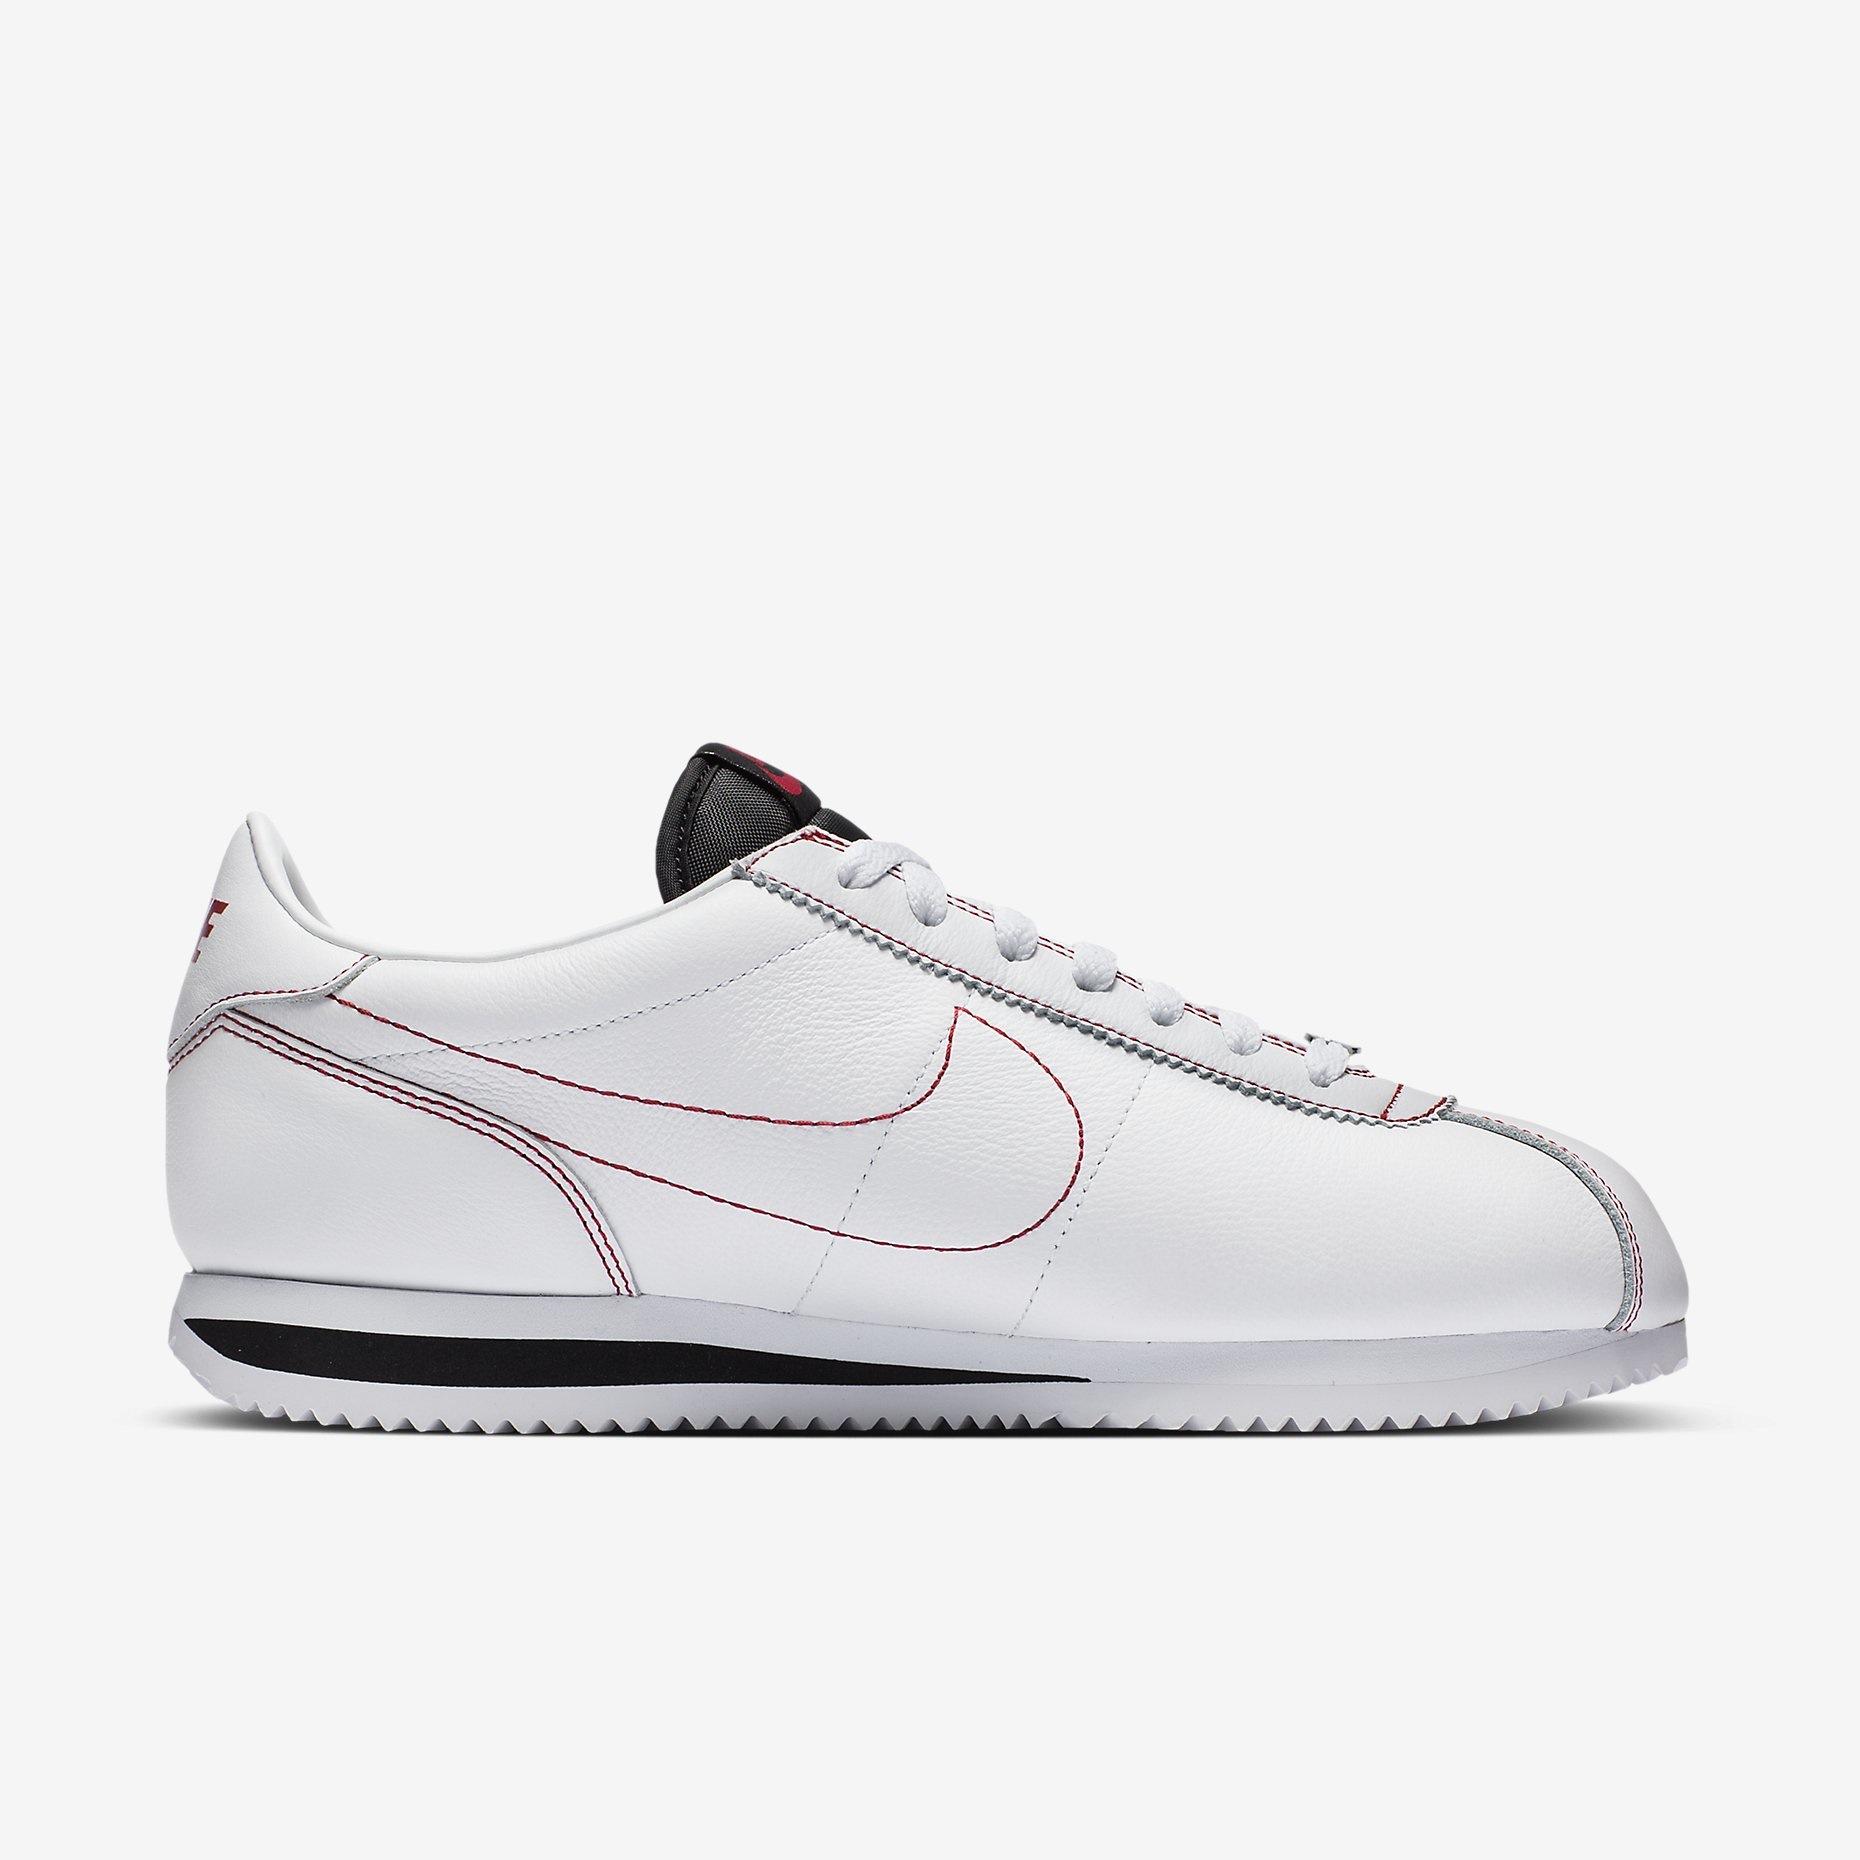 the latest 62ee7 bd42d Kendrick Lamar x Nike Cortez Kenny 1 - Sneakers.fr